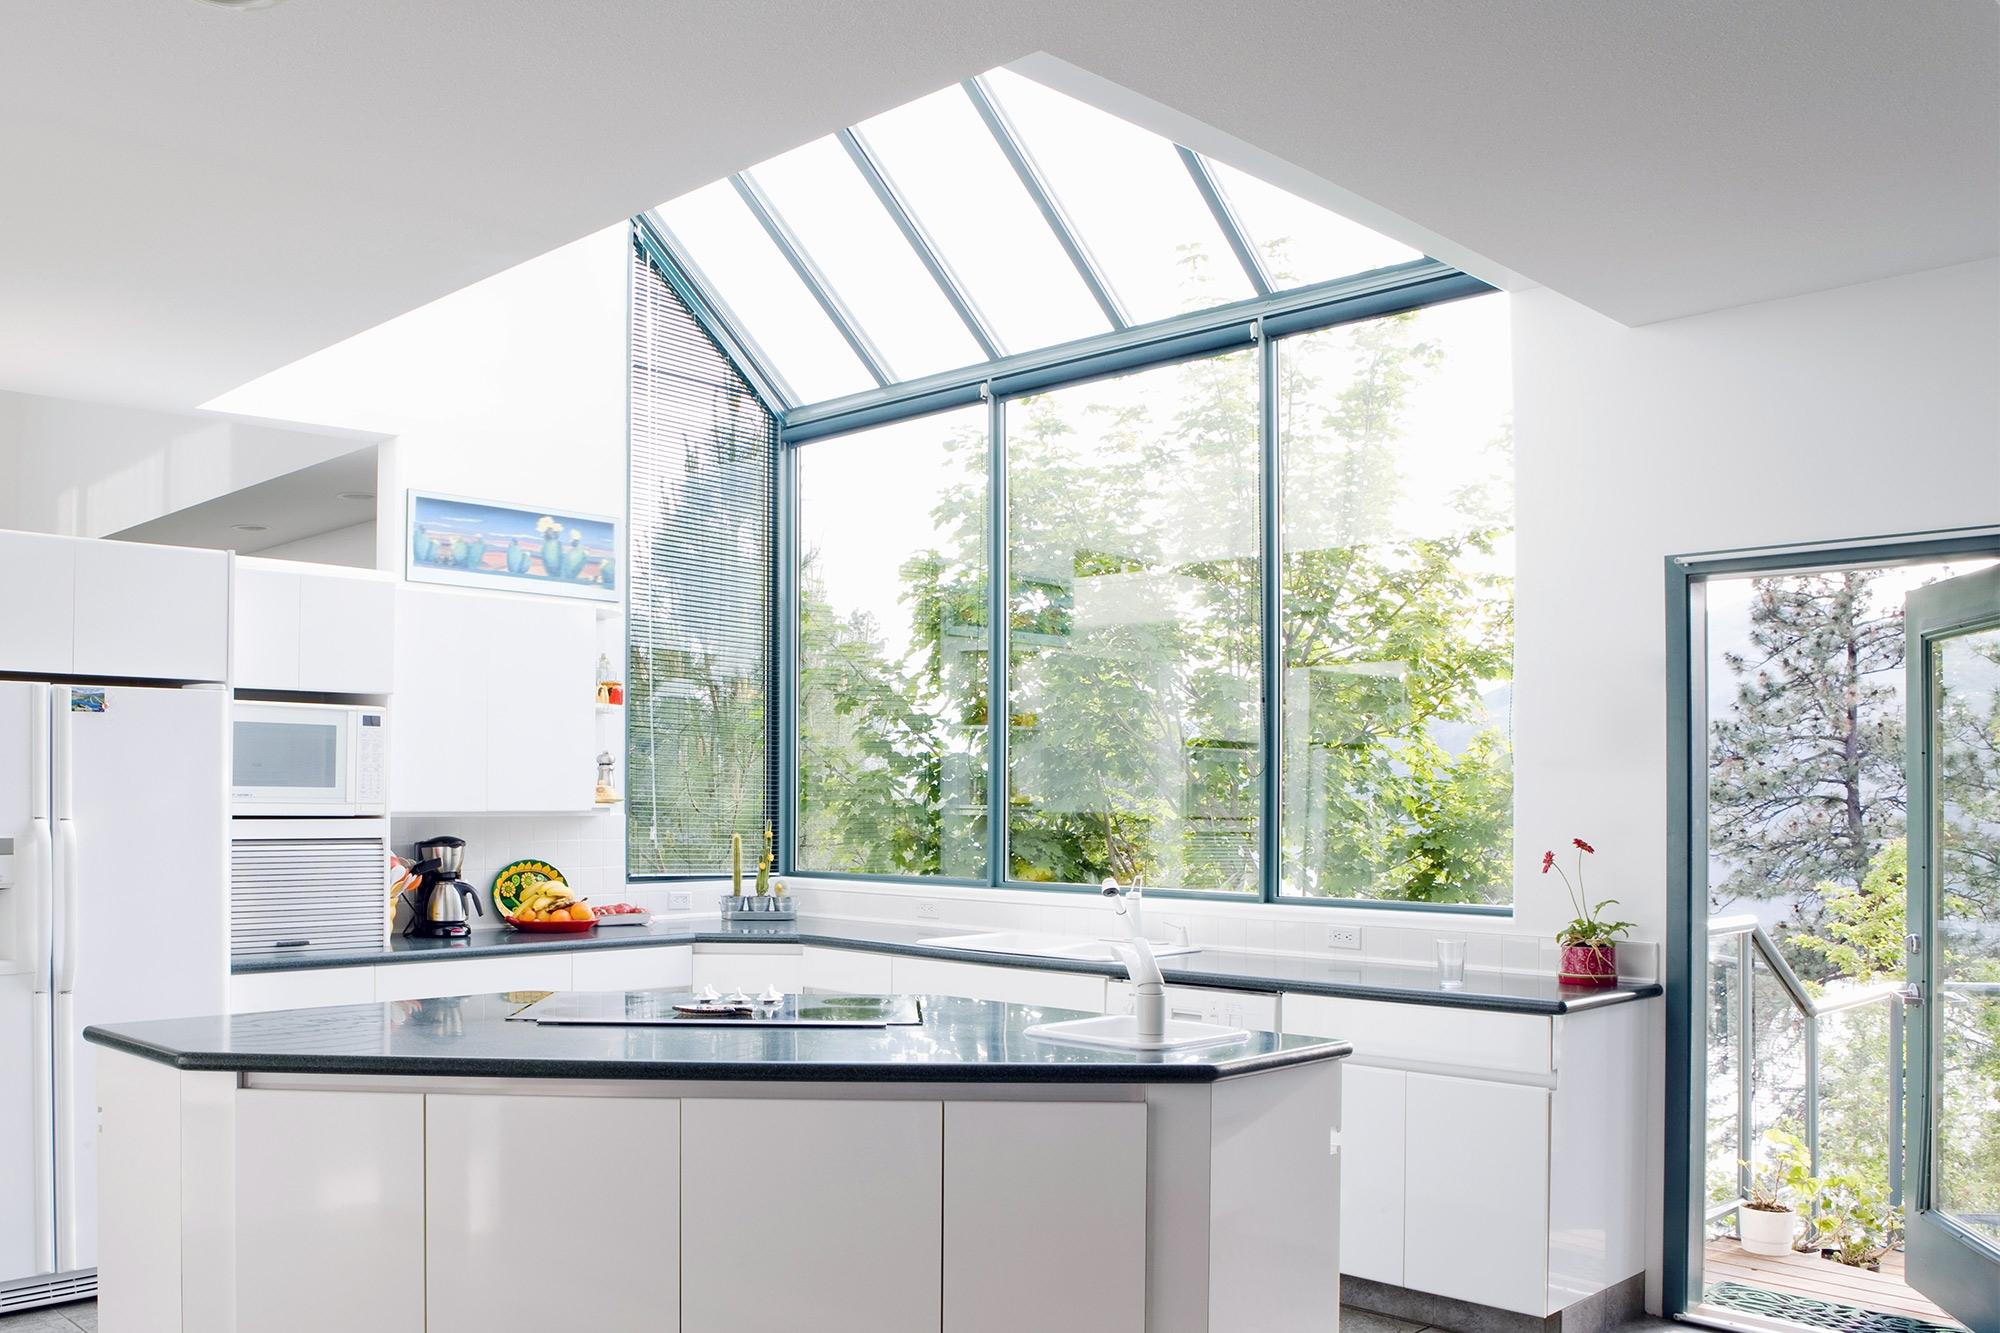 Кухня без верхних шкафов в стиле модерн